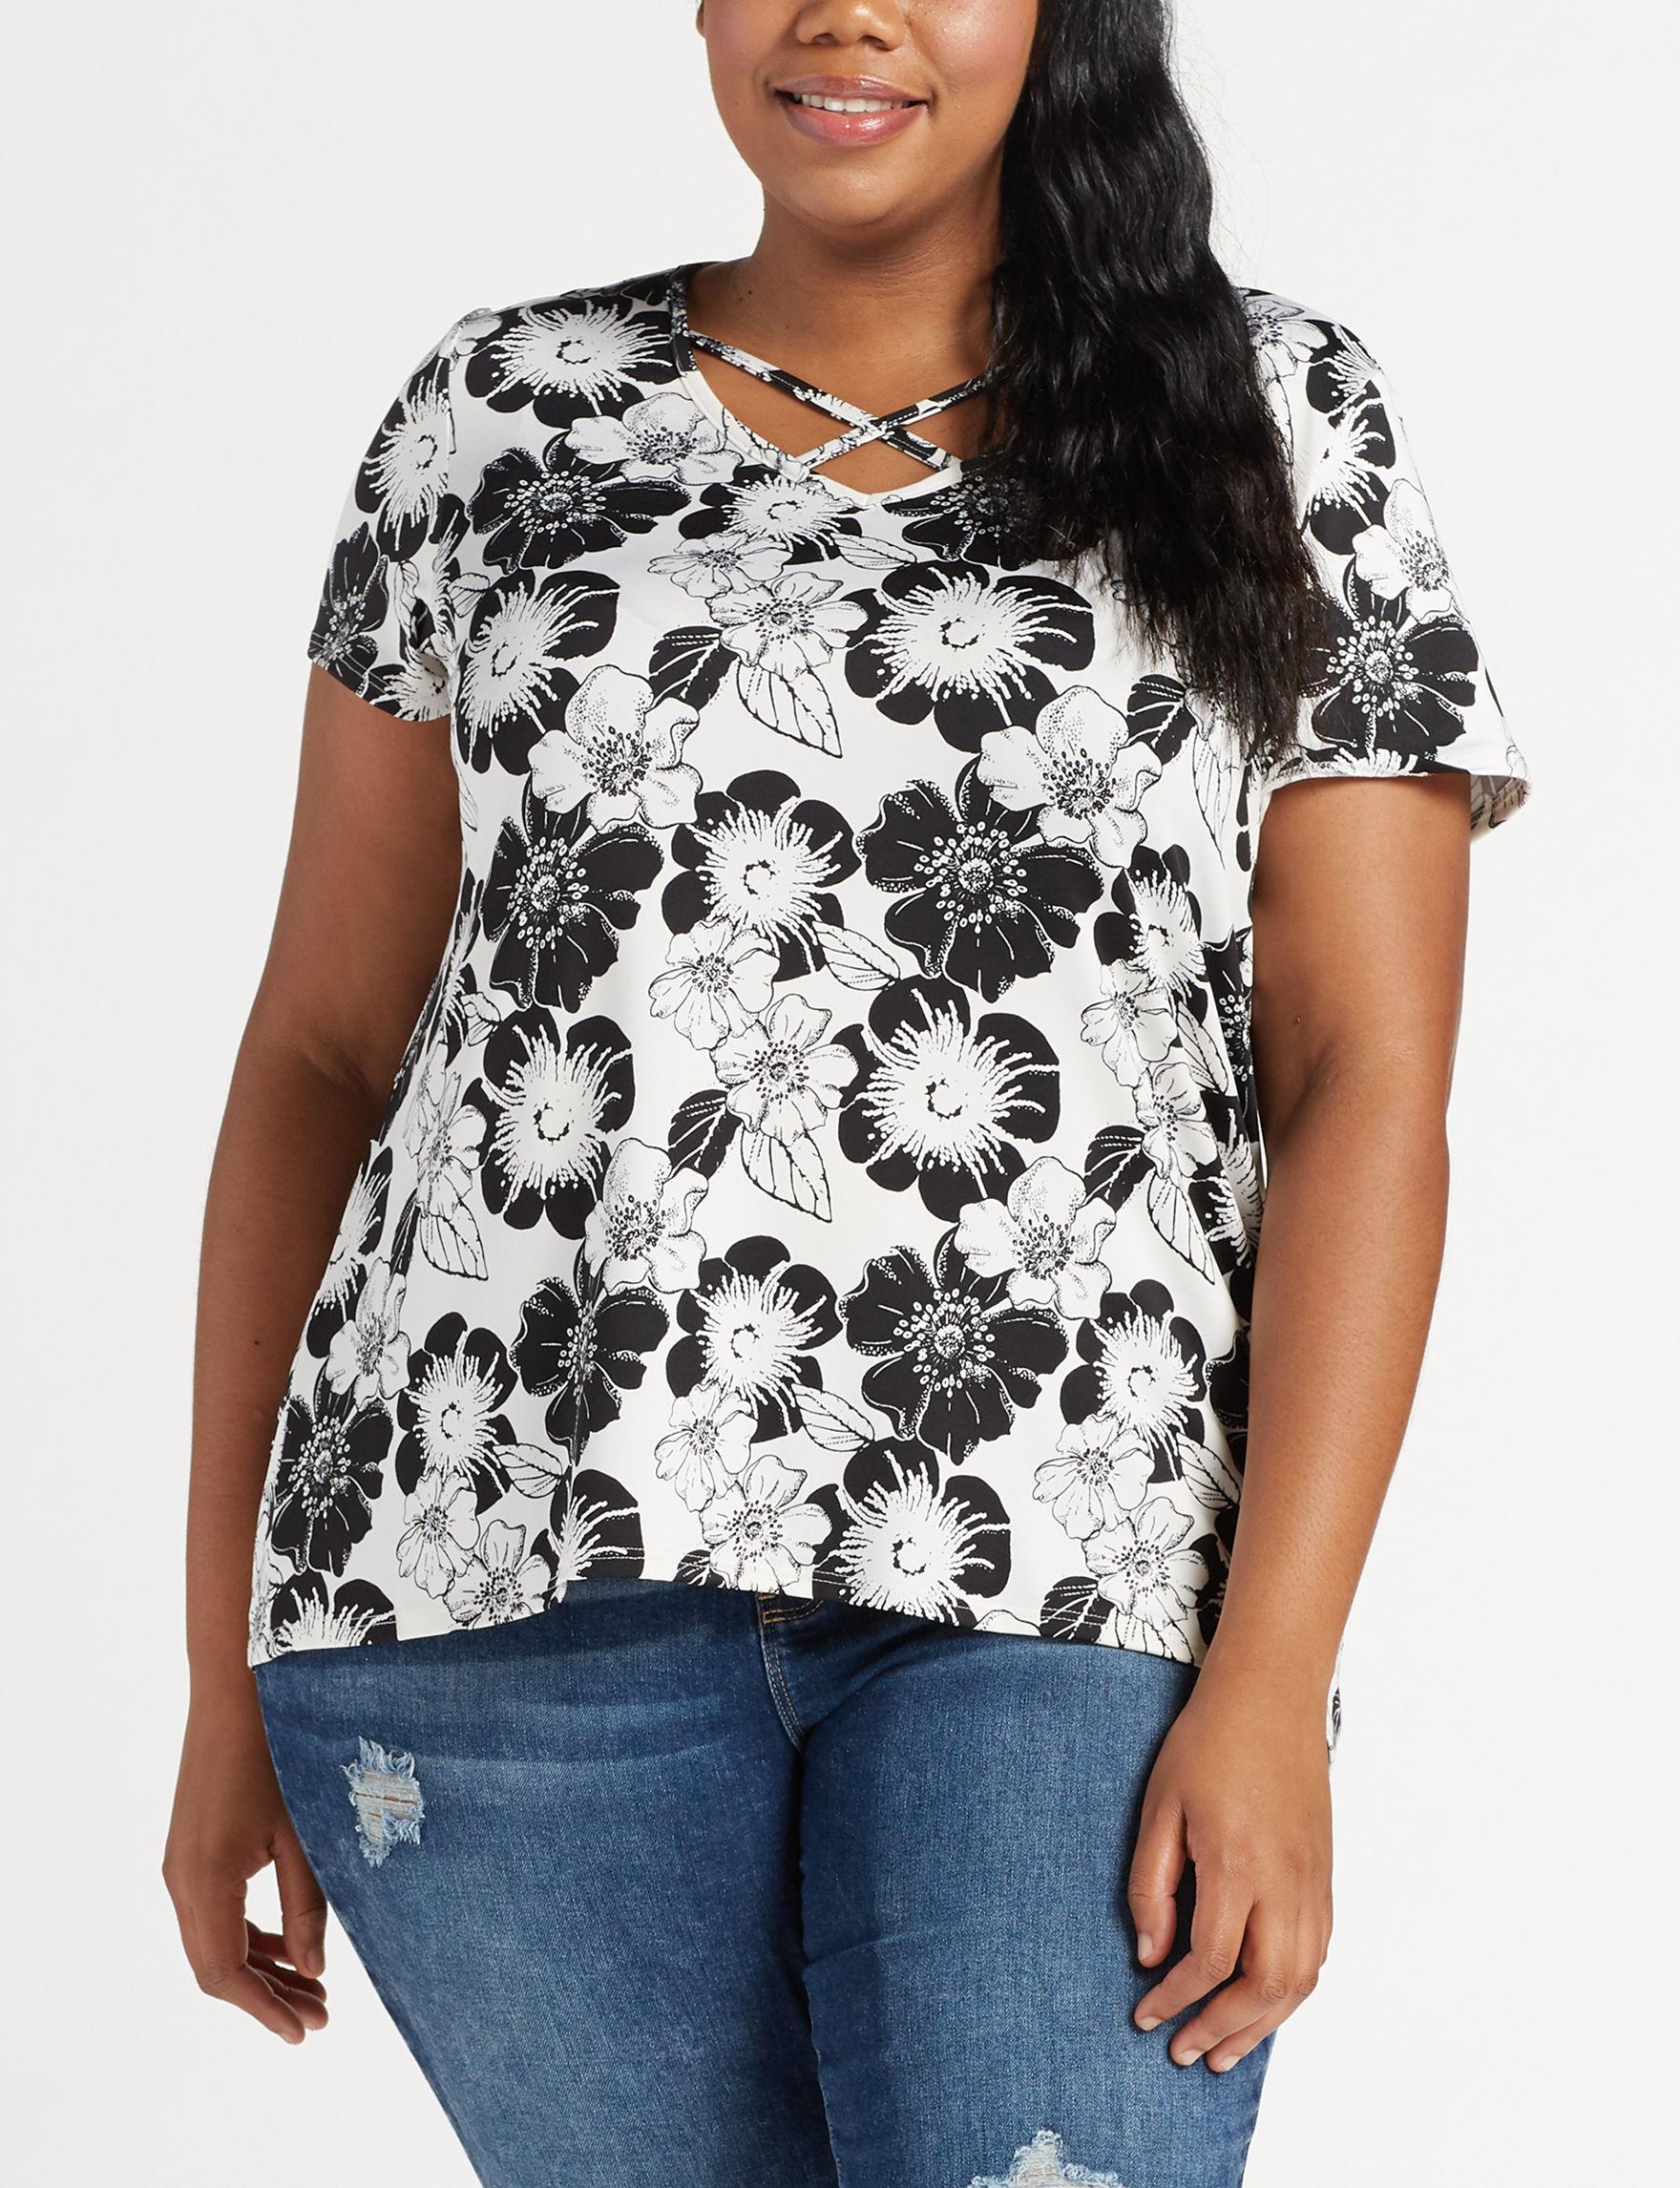 Cathy Daniels Ivory Shirts & Blouses